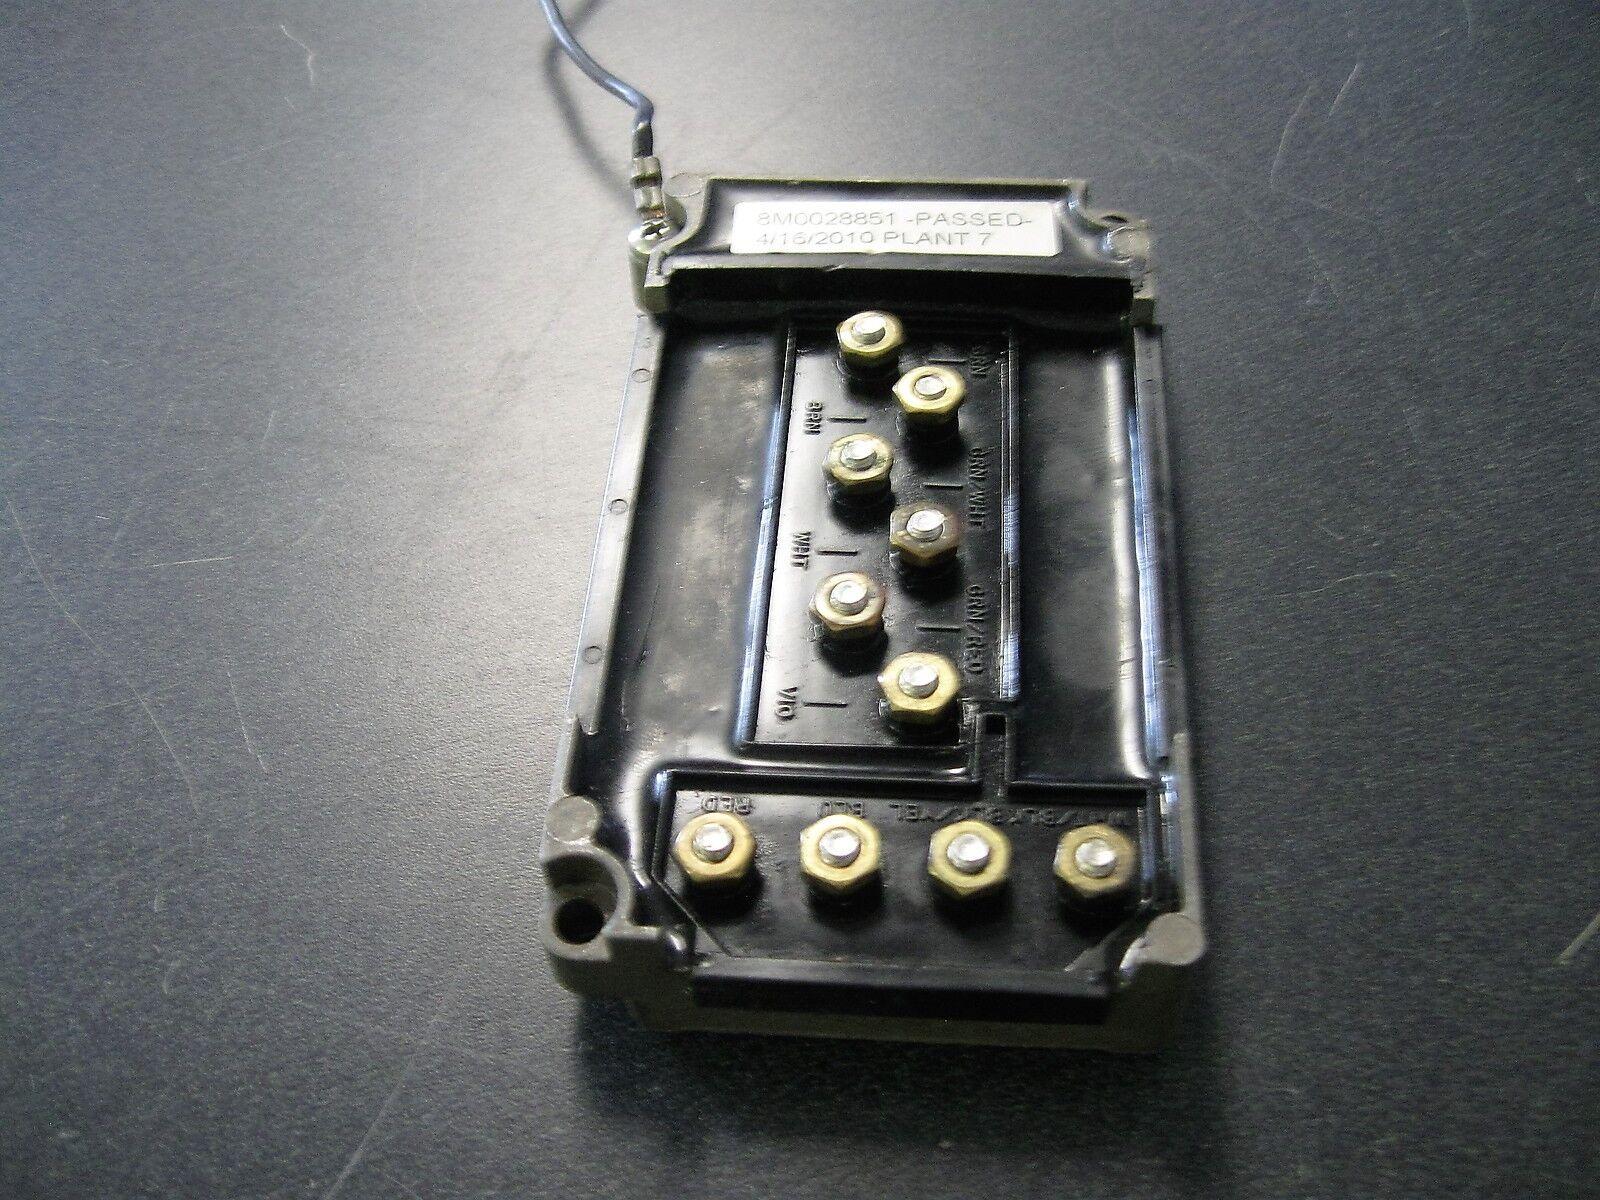 Mercury Outboard Schaltbox Montage 7778A12